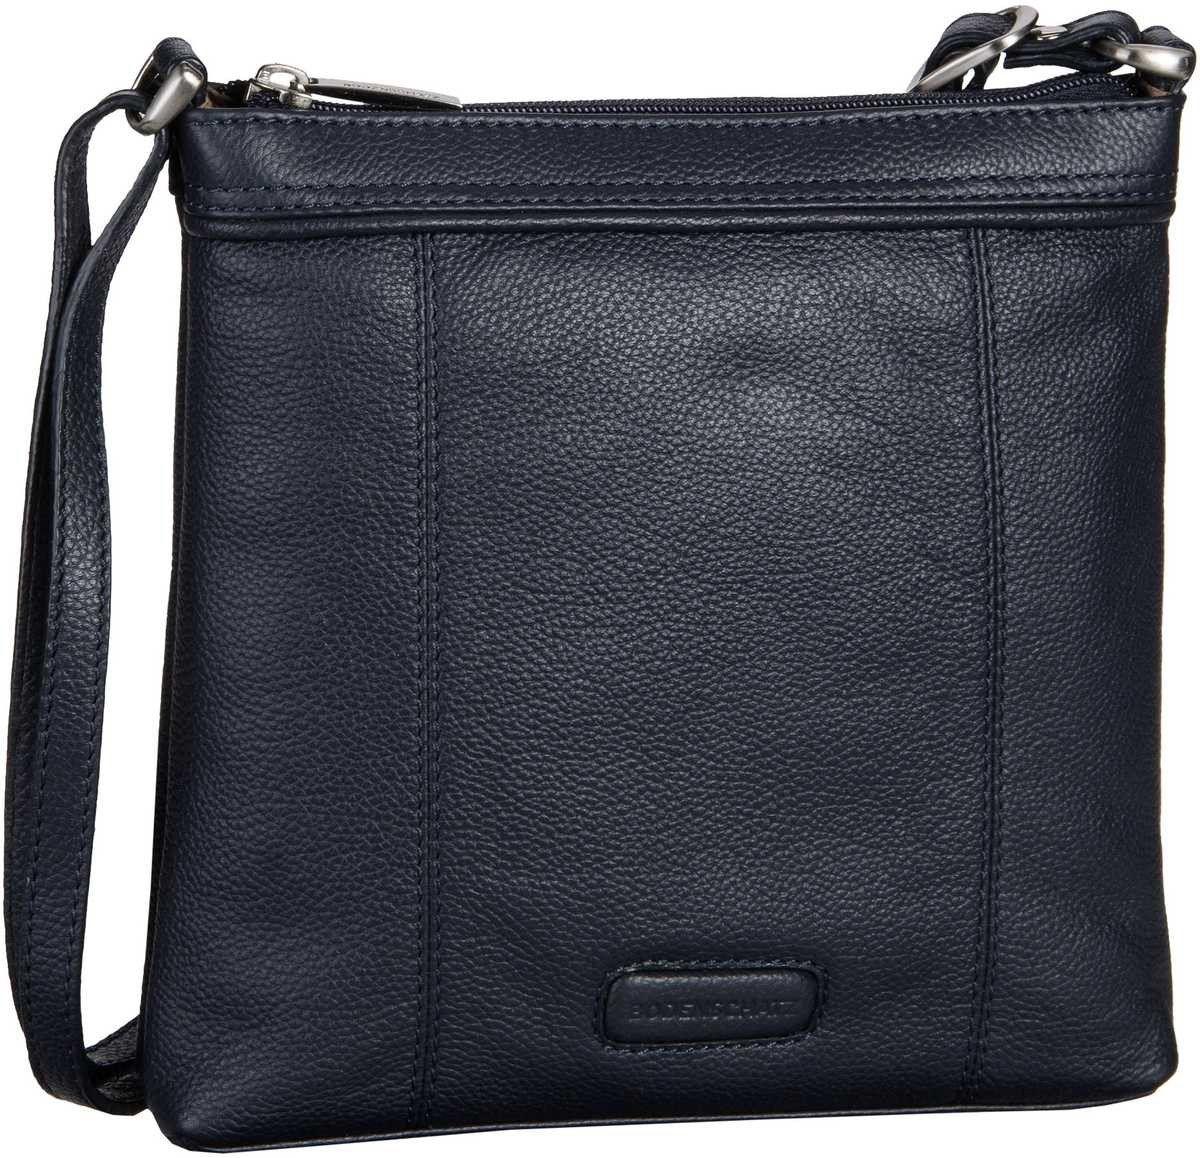 Royal Damentasche Bag Nappa Bodenschatz Zip Ocean zpSMqUV